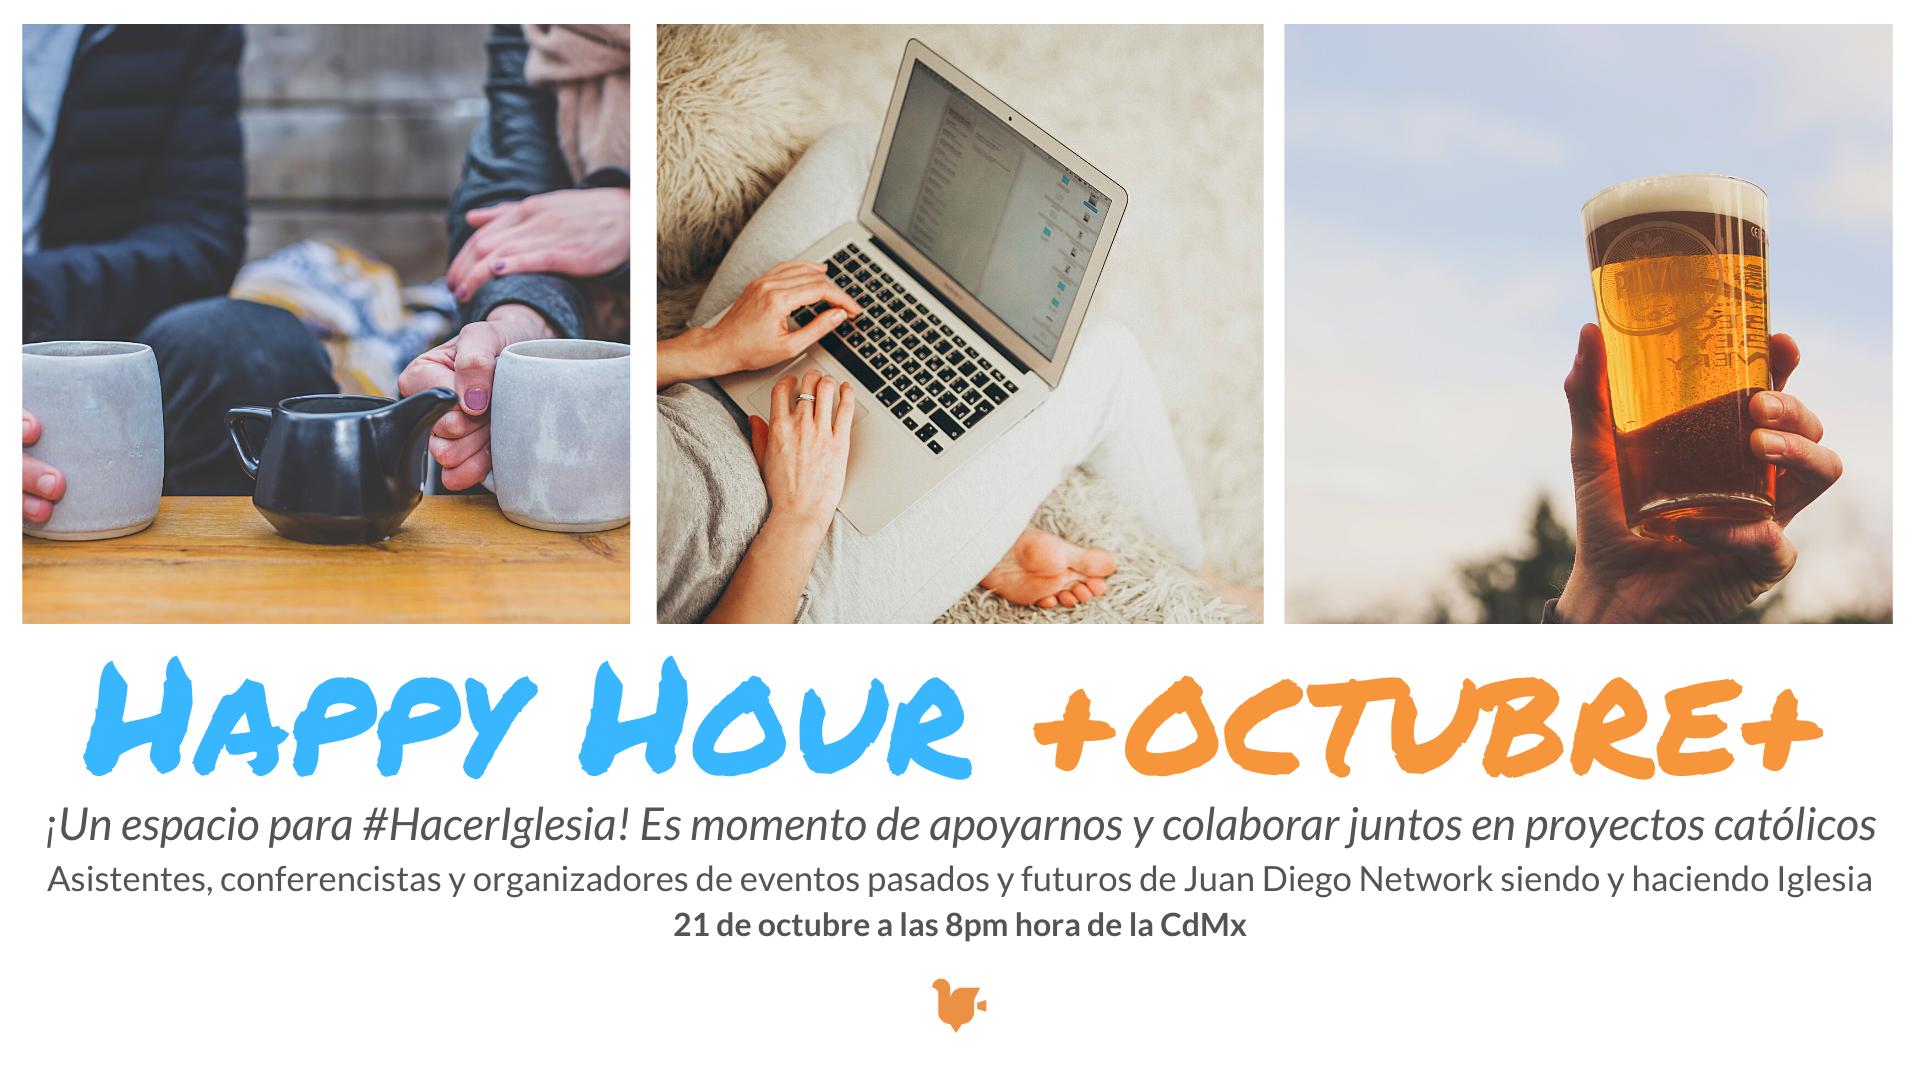 Happy Hour octubre 2020 iglesia juan diego network